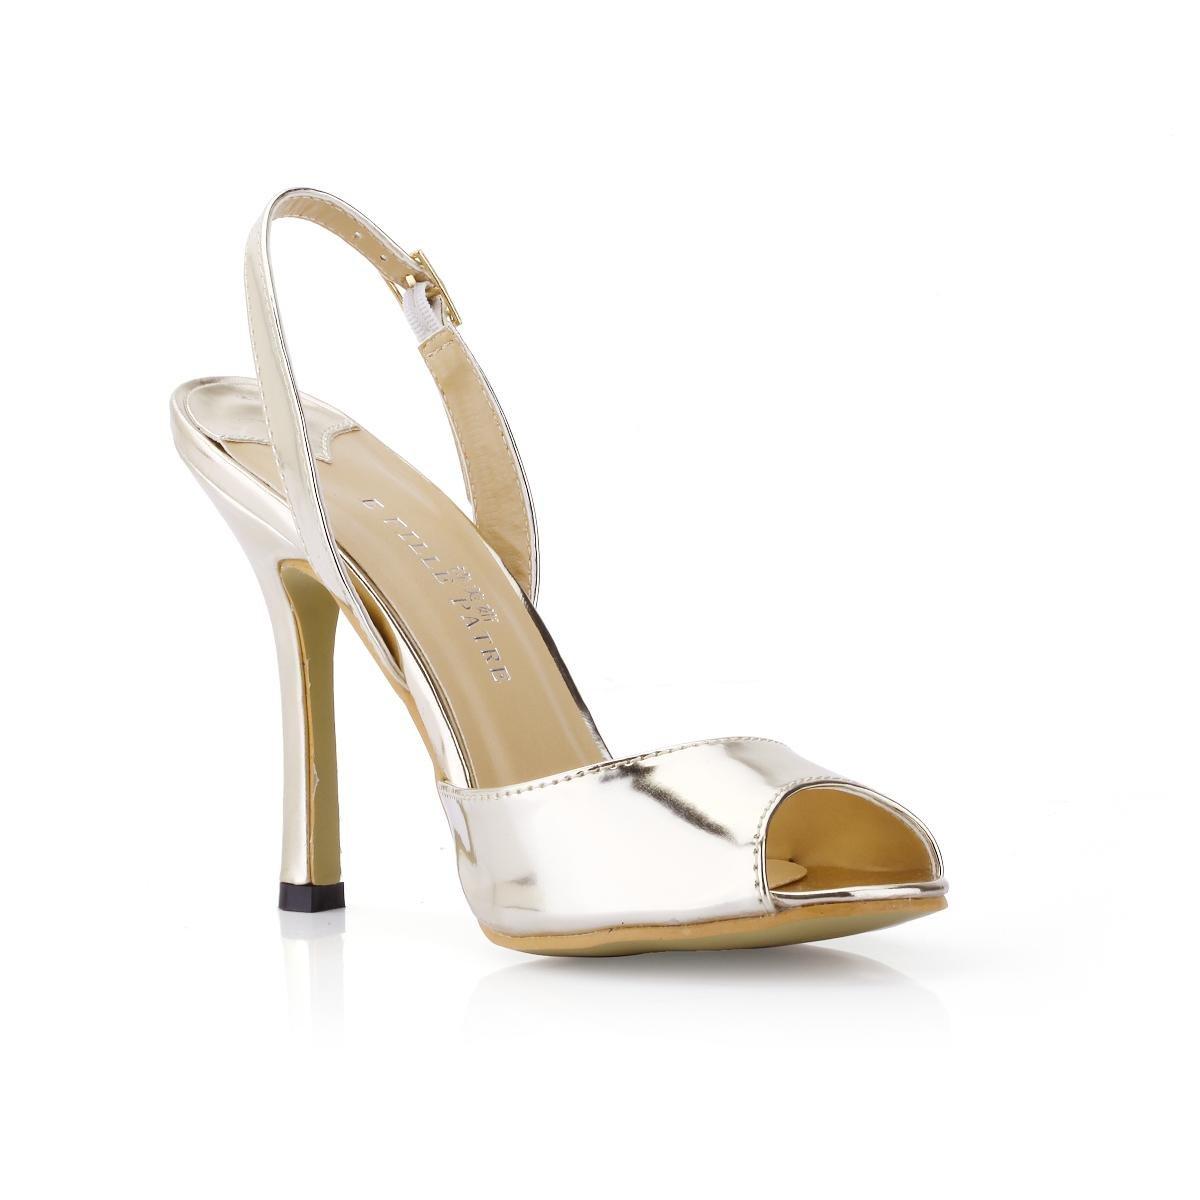 Best 4U® Sandalias de las mujeres espejo PU hebilla de metal Stiletto 10CM tacones altos Peep Toe Shoes Golden Summer Slingback